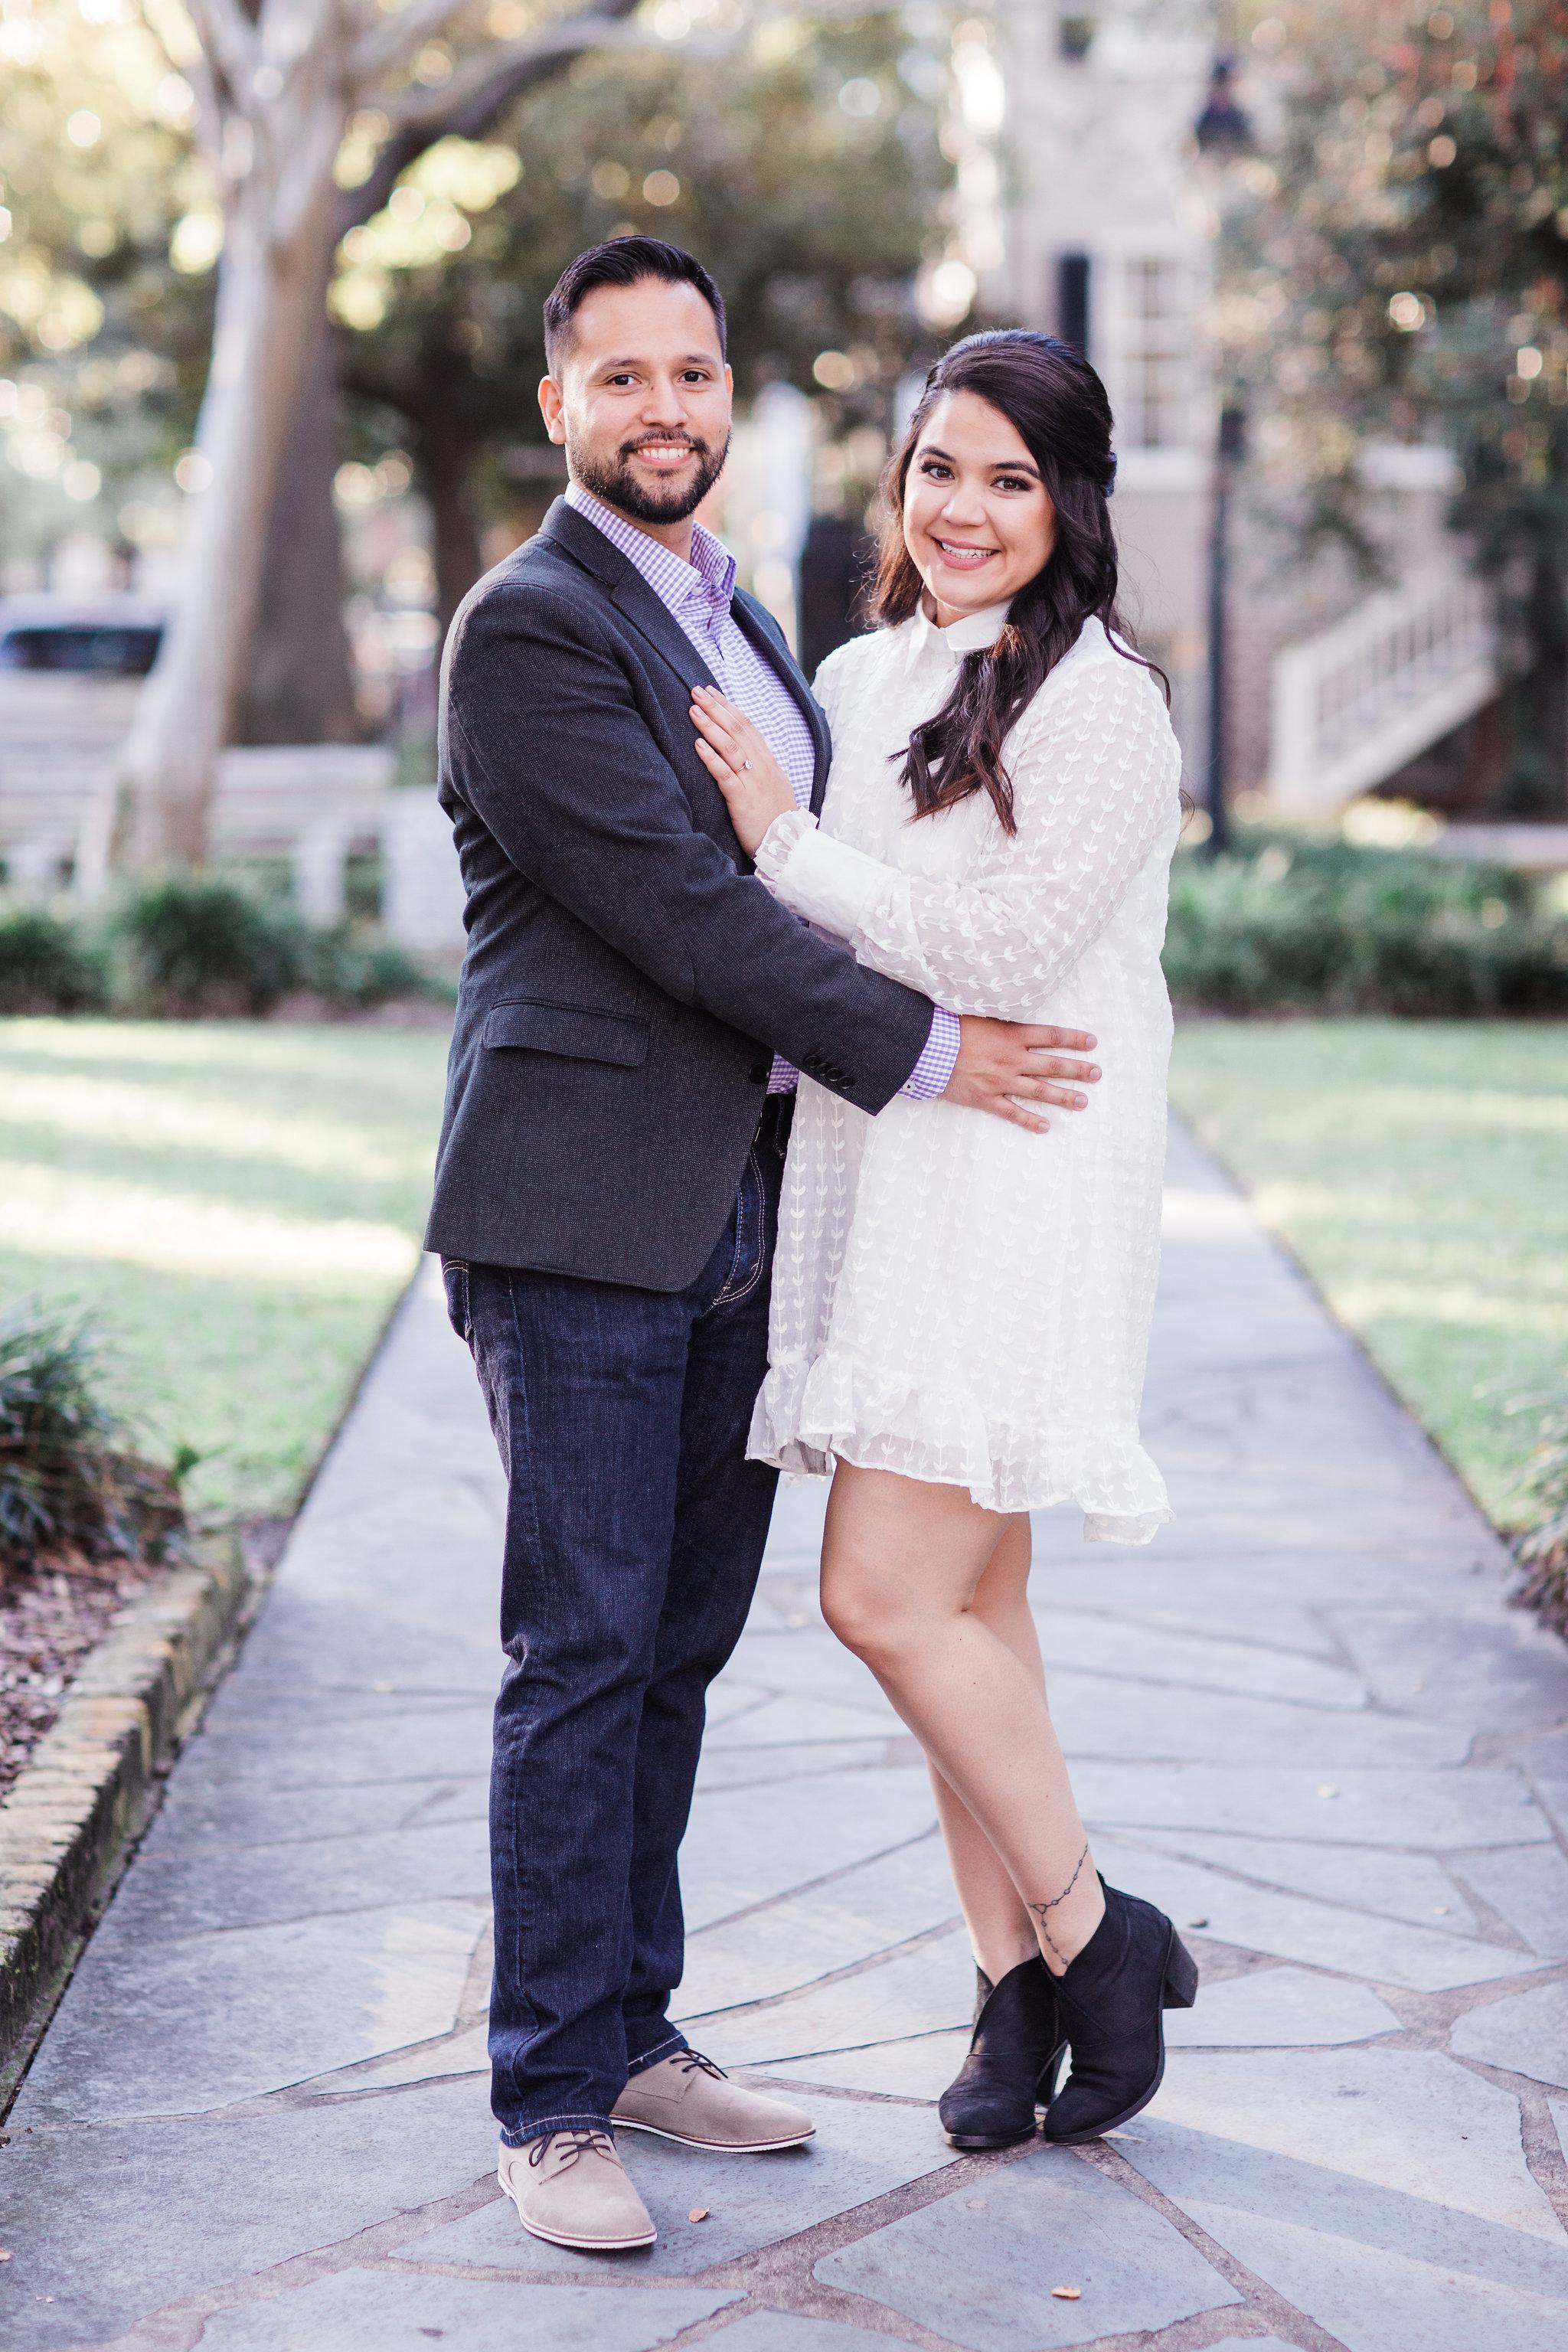 apt-b-photography-Savannah-wedding-photographer-savannah-engagement-photographer-historic-savannah-engagement-savannah-weddings-hilton-head-wedding-photographer-hilton-head-engagement-27.jpg